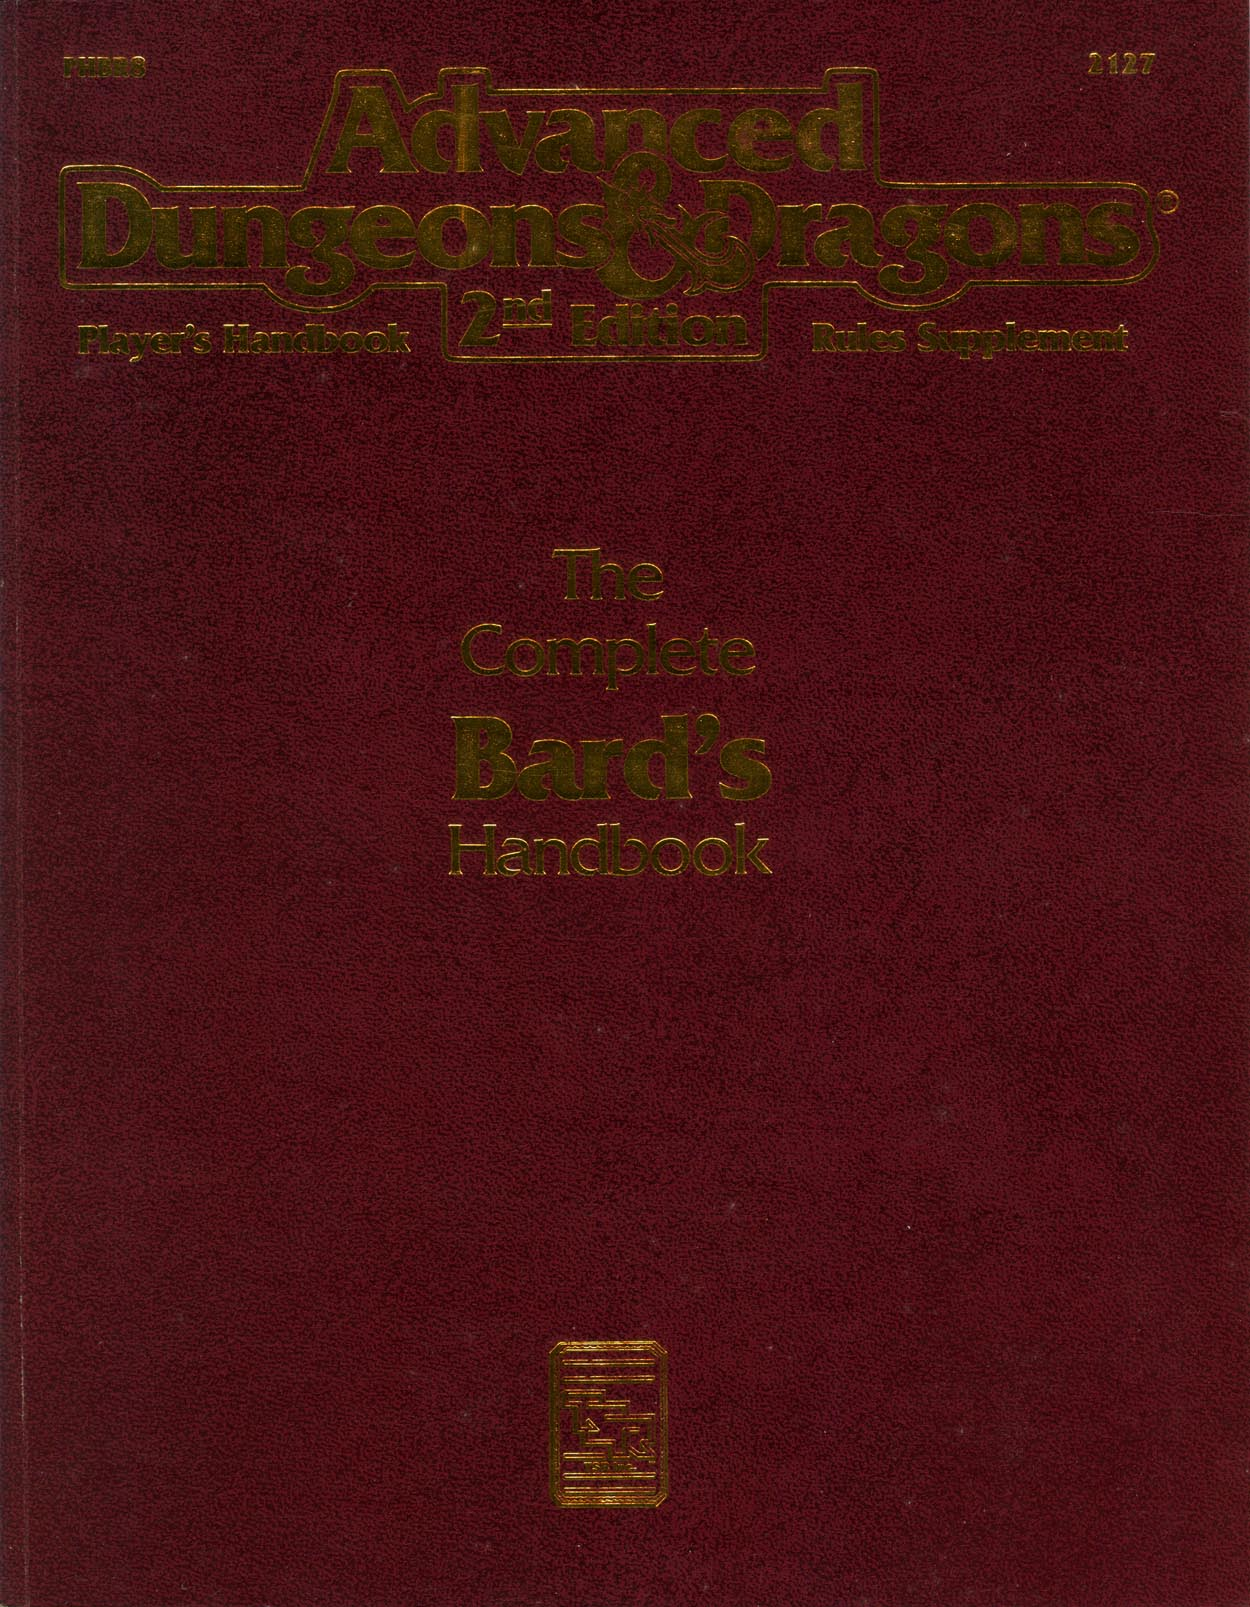 The Complete Bard's Handbook